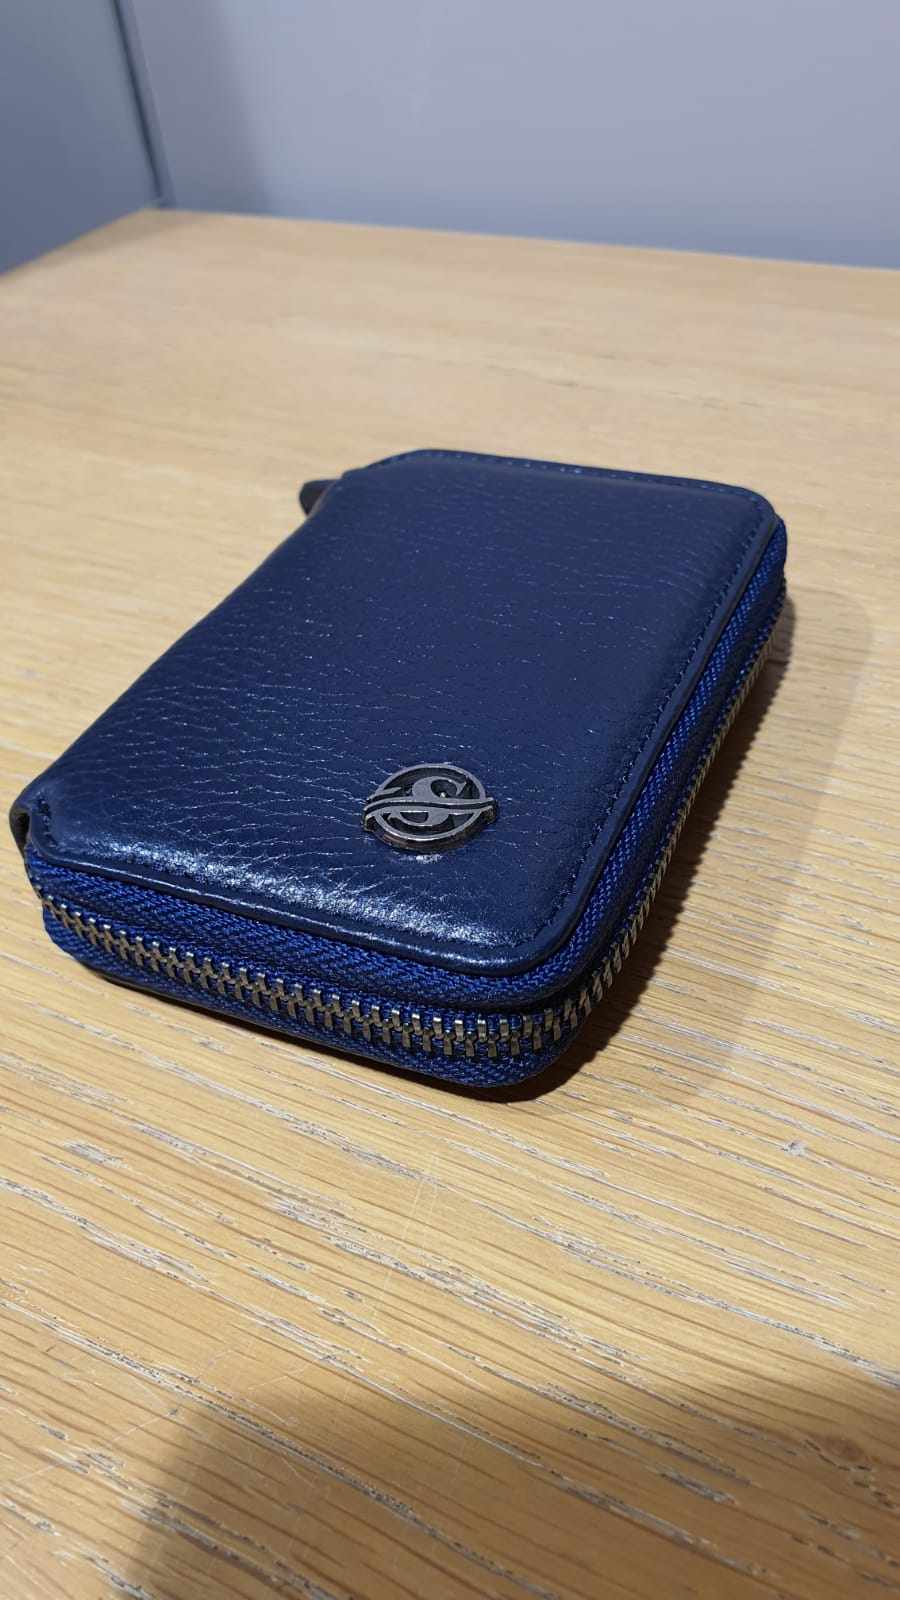 Aysoti Sardinelli Navyblue Zippered Leather Mini Wallet